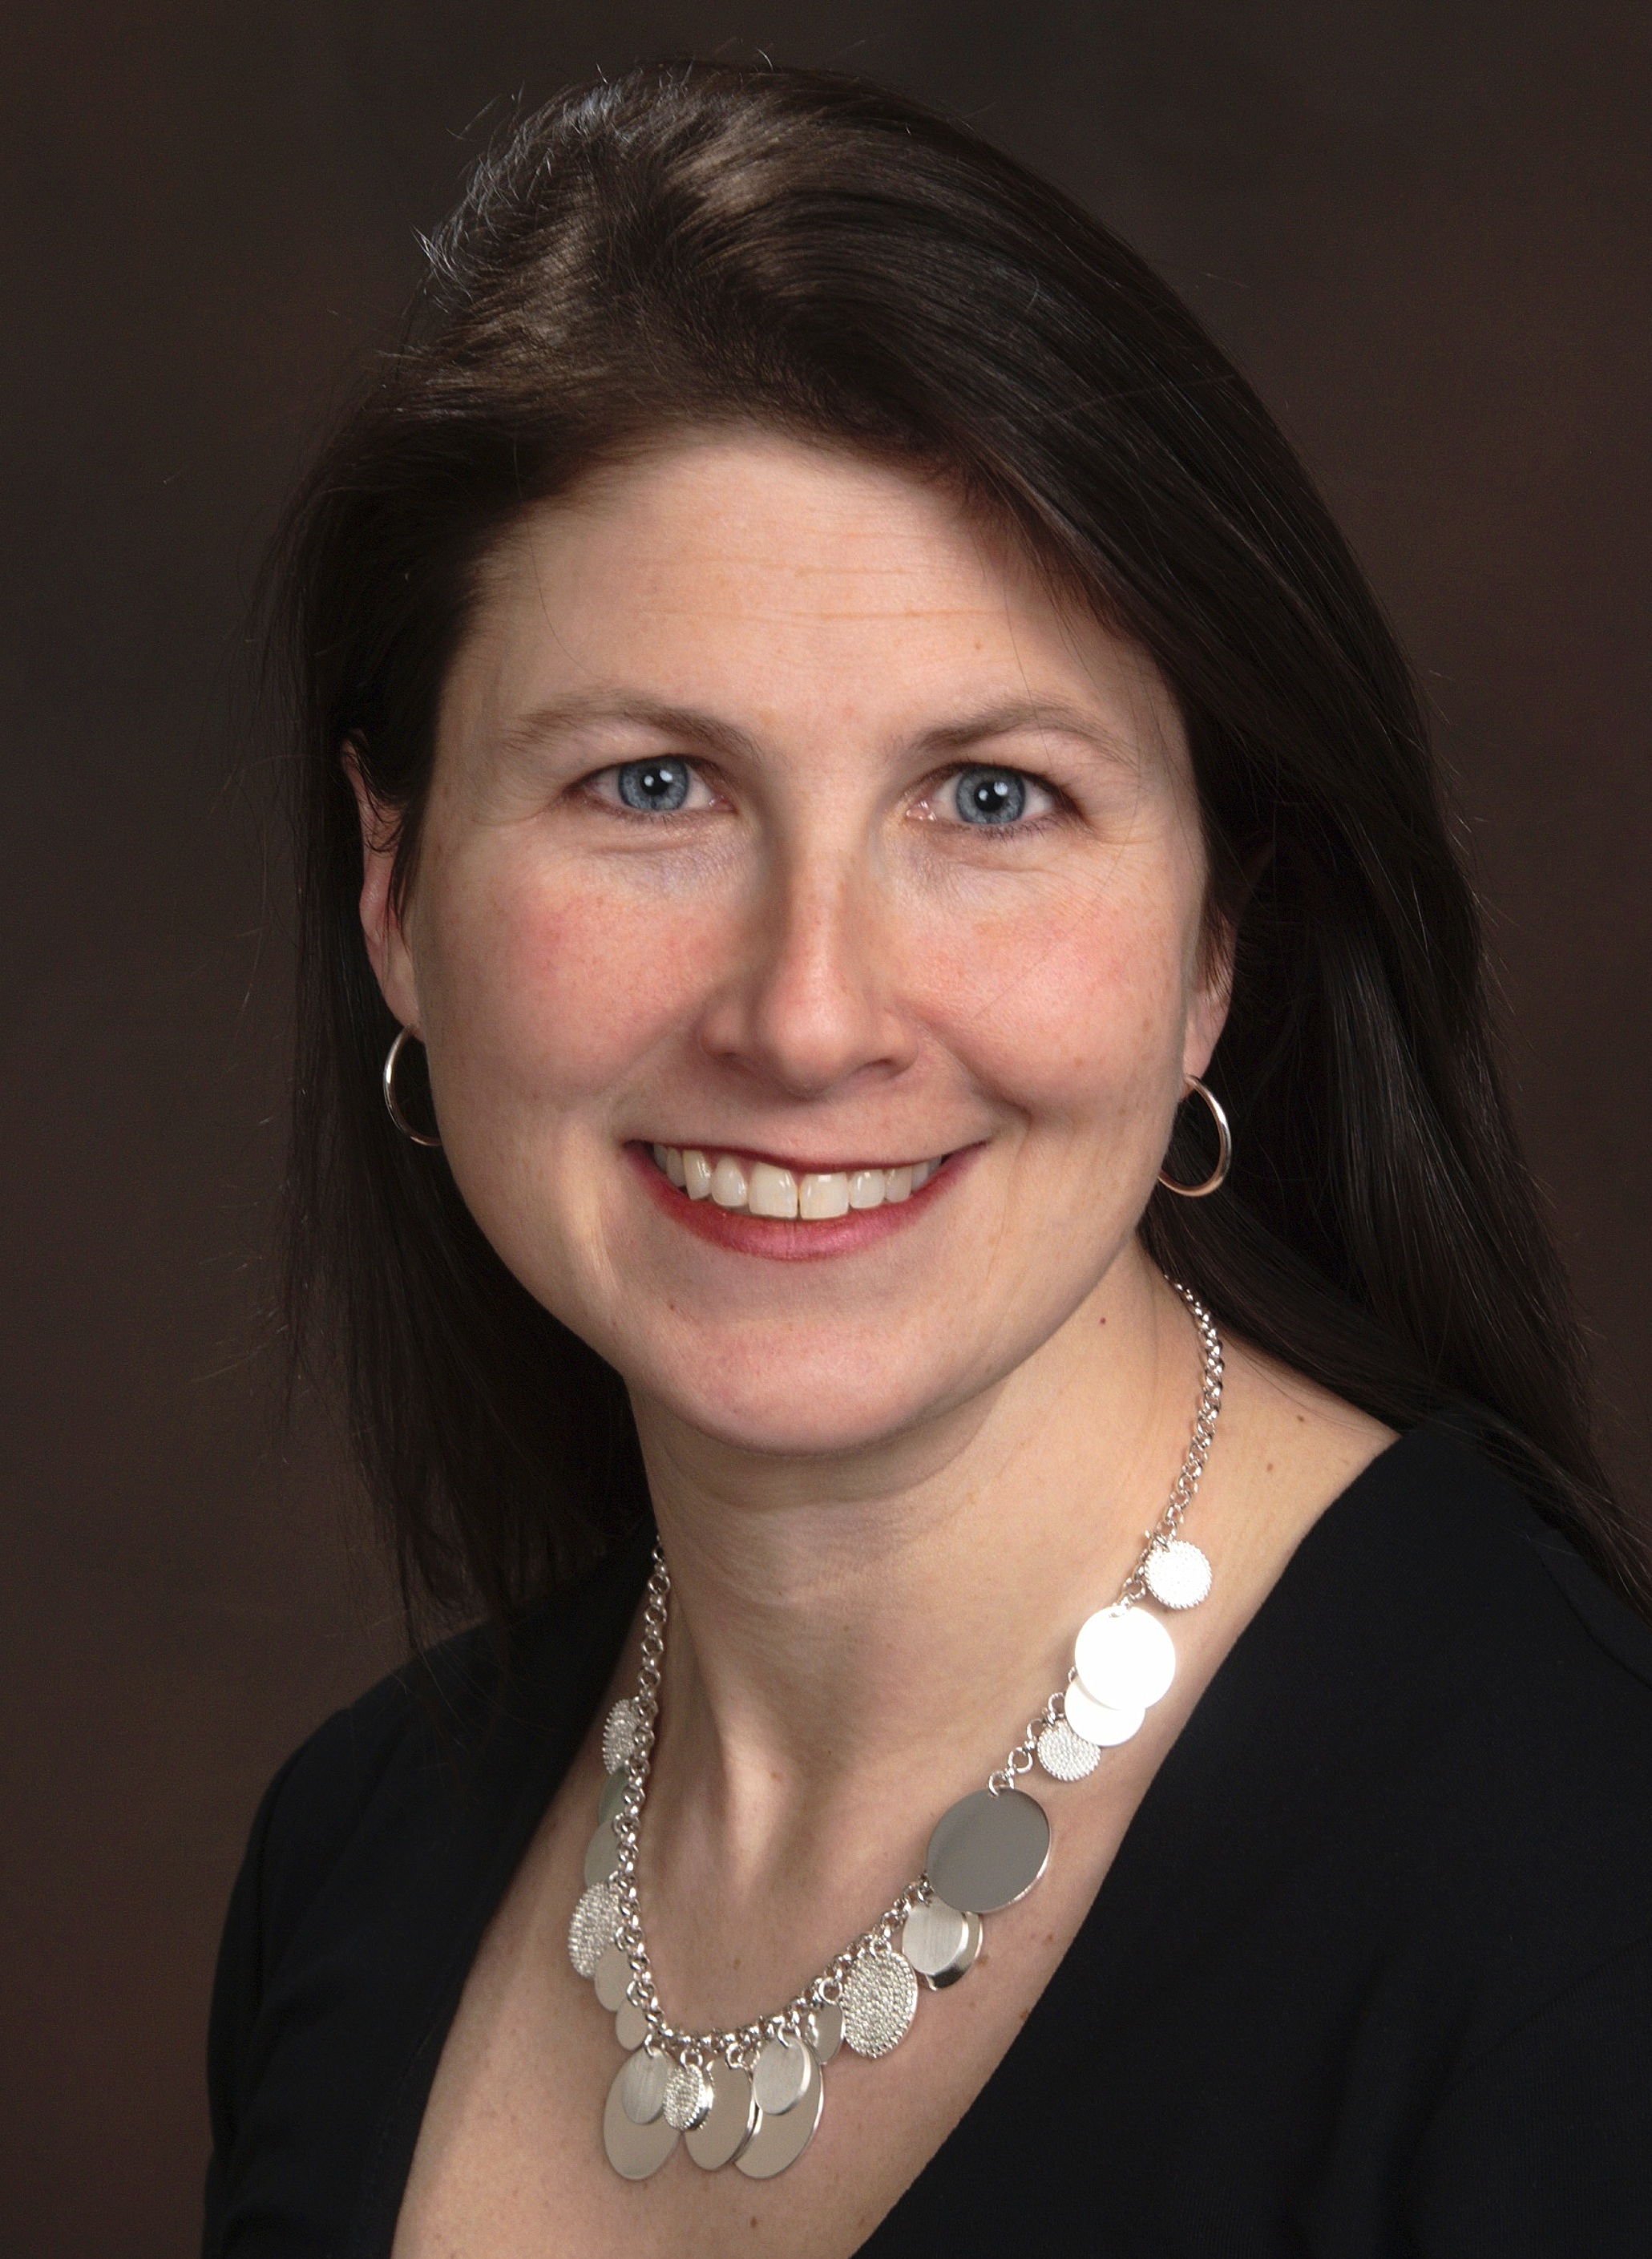 Annie Schwain, MA, LADC, LAMFT      Let's Connect      612.325.2919